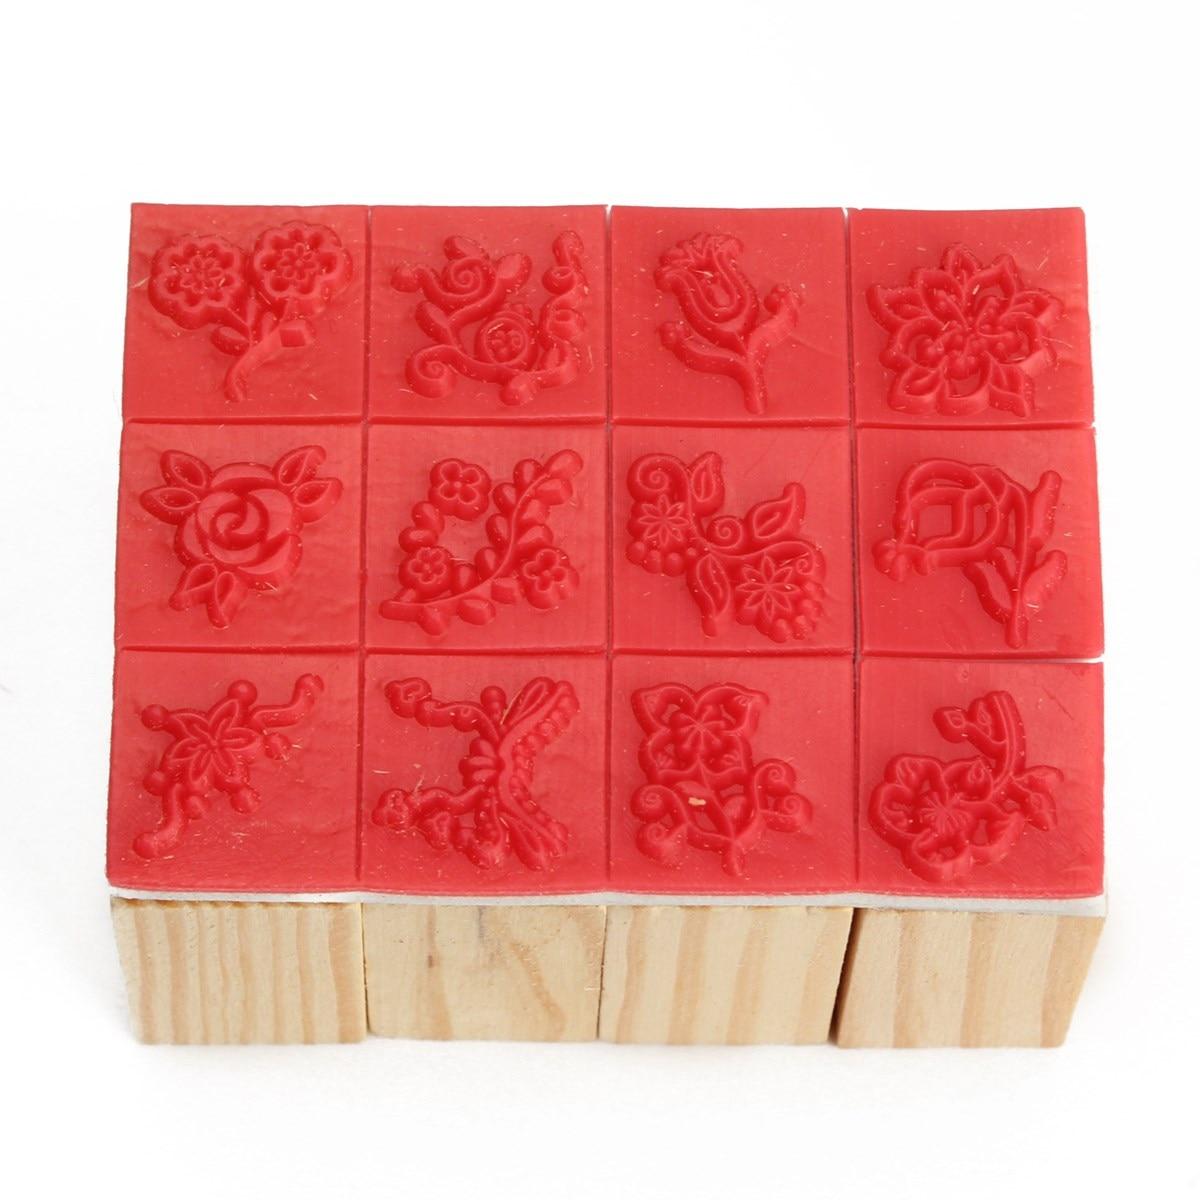 12pcs/set DIY Wooden Rubber Stamp Set Seal Flower DIY Diary Scrapbooking Gift Decor<br><br>Aliexpress